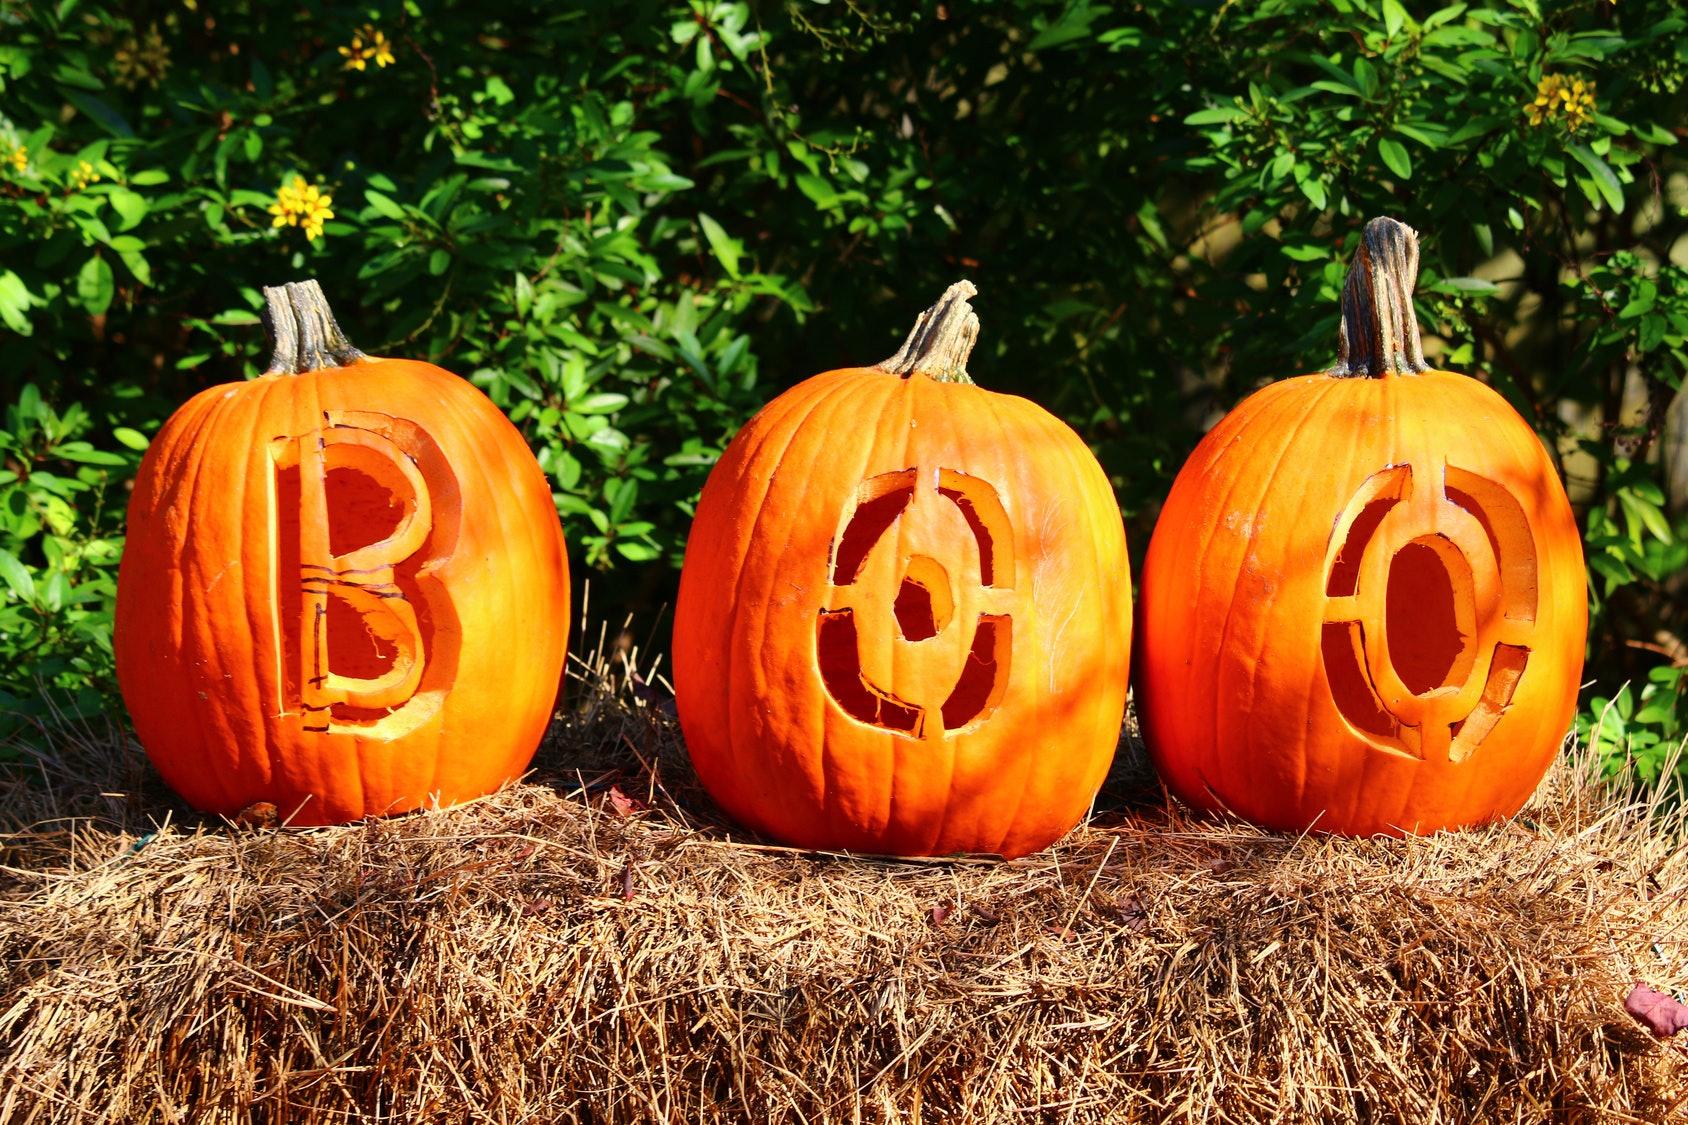 11 Creative Pumpkin Carving Ideas For Halloween 2018 That ...